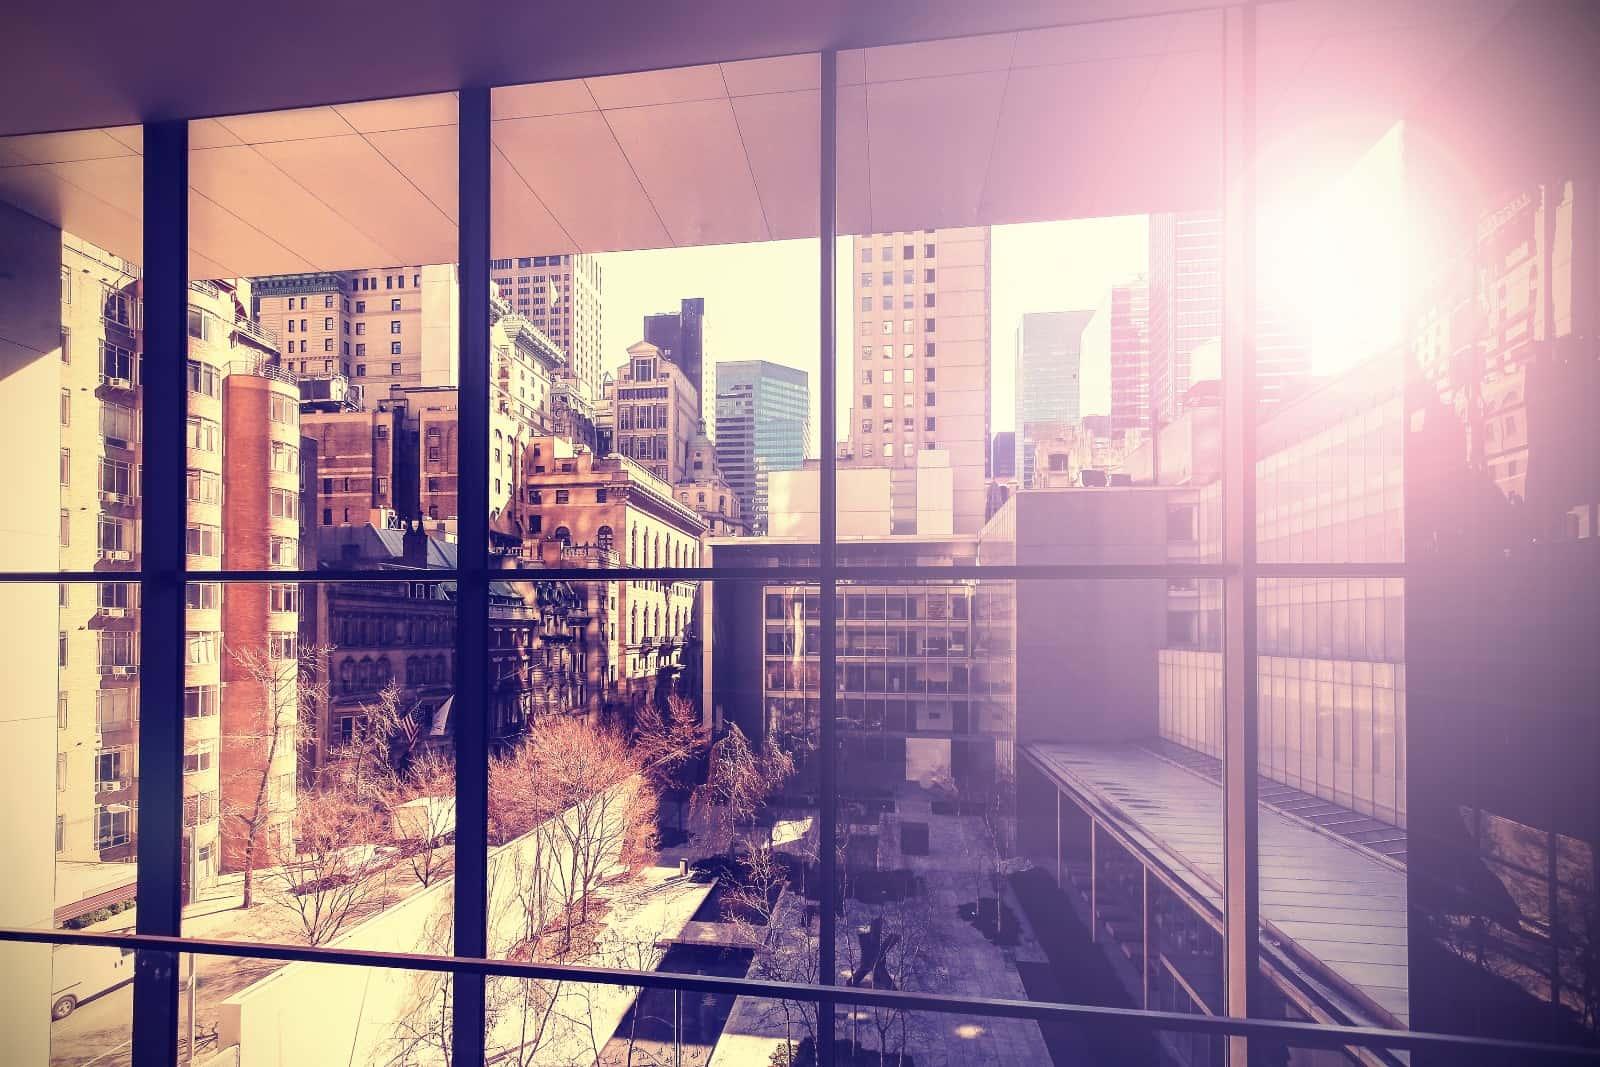 Sun shining through office window